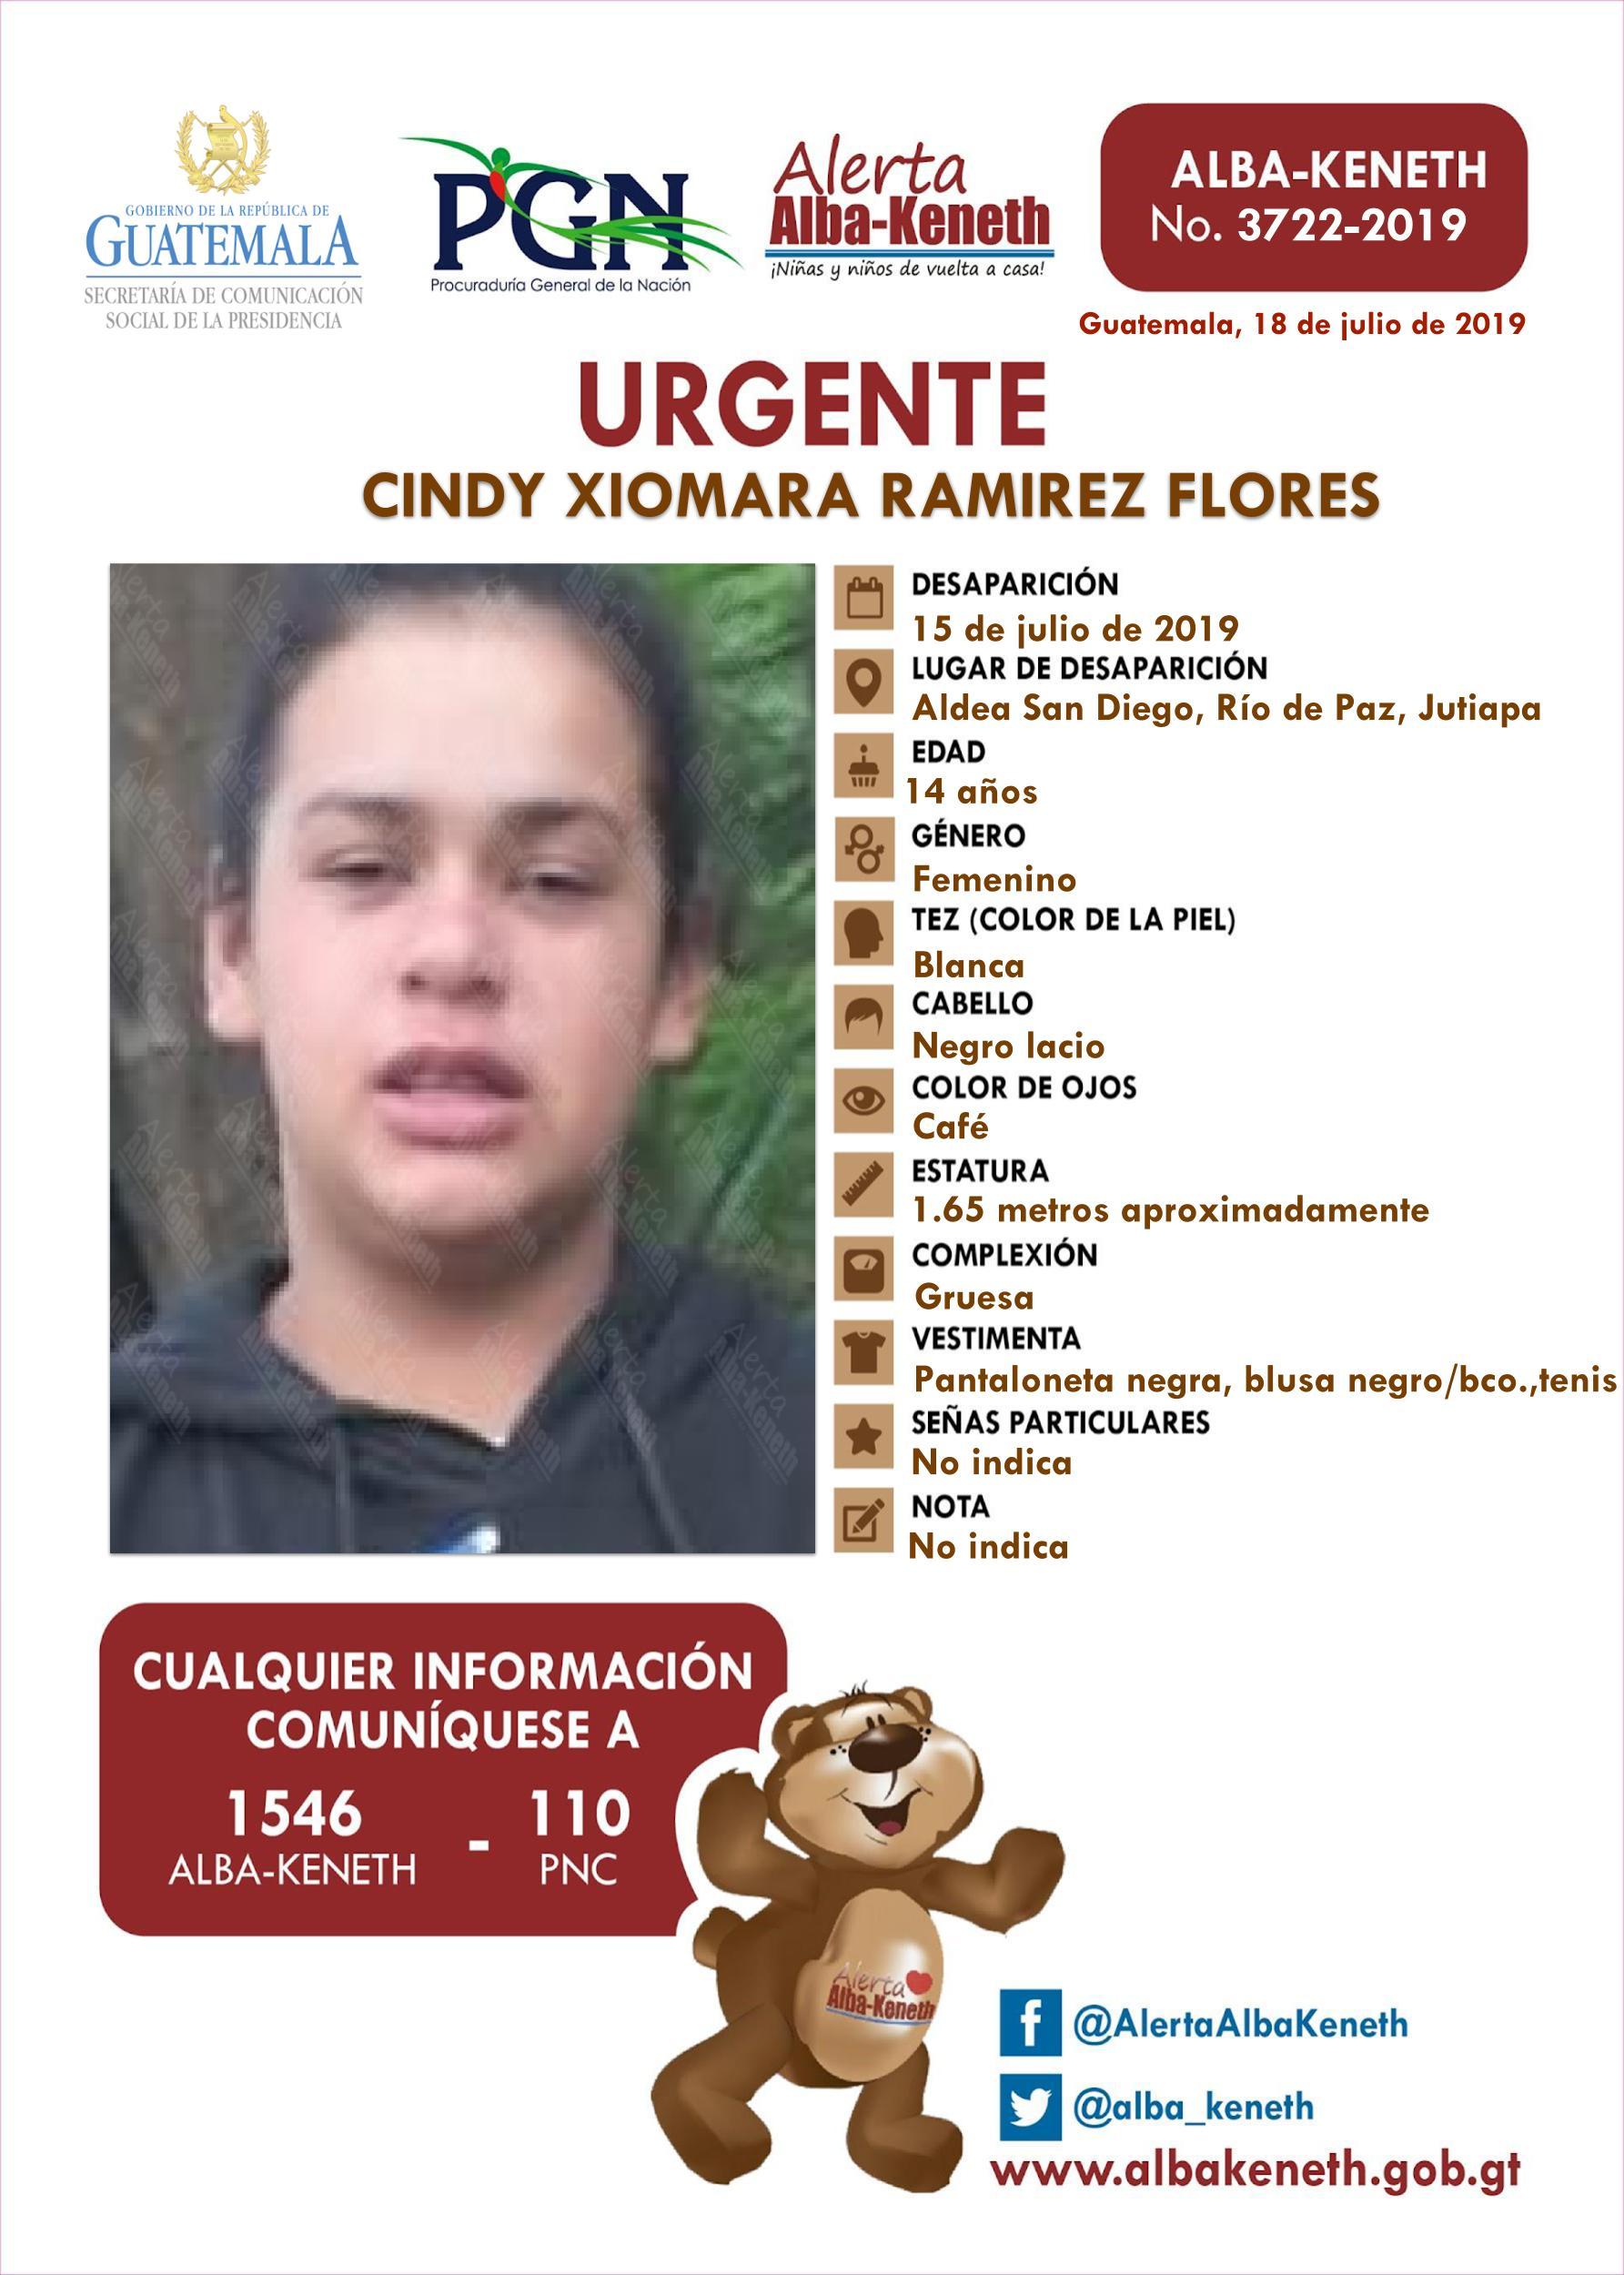 Cindy Xiomara Ramirez Flores